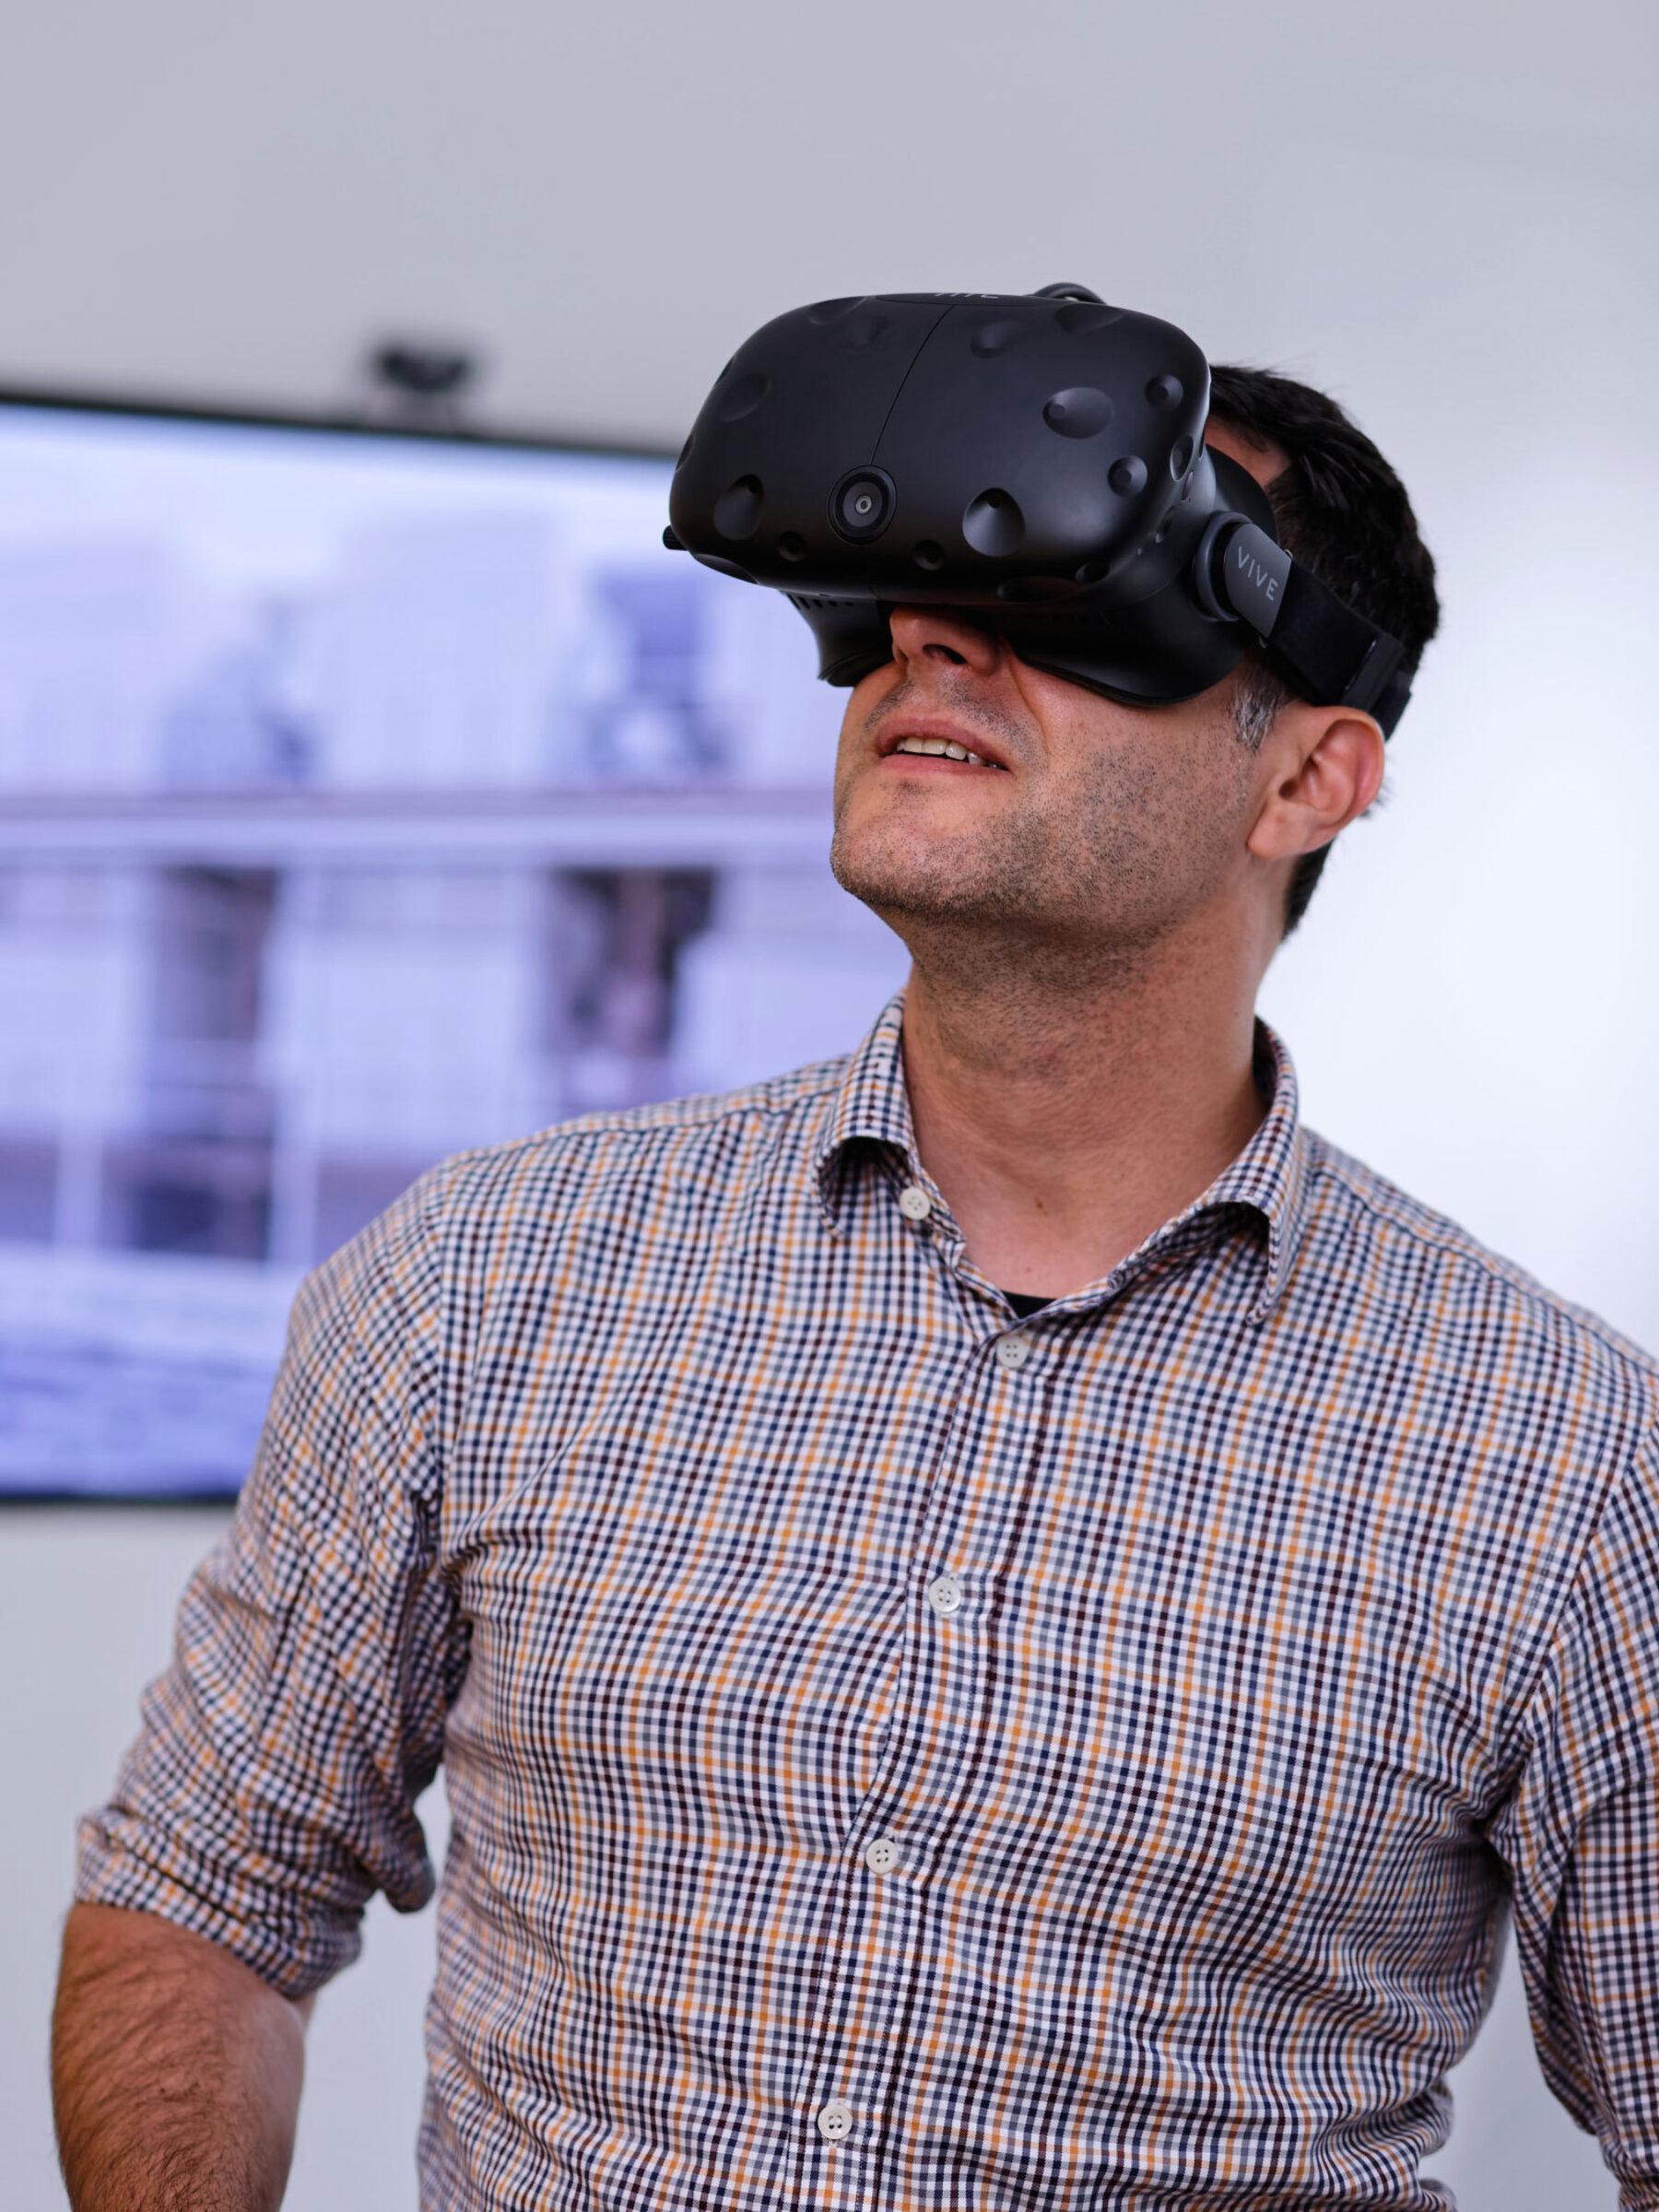 Staff using VR headset